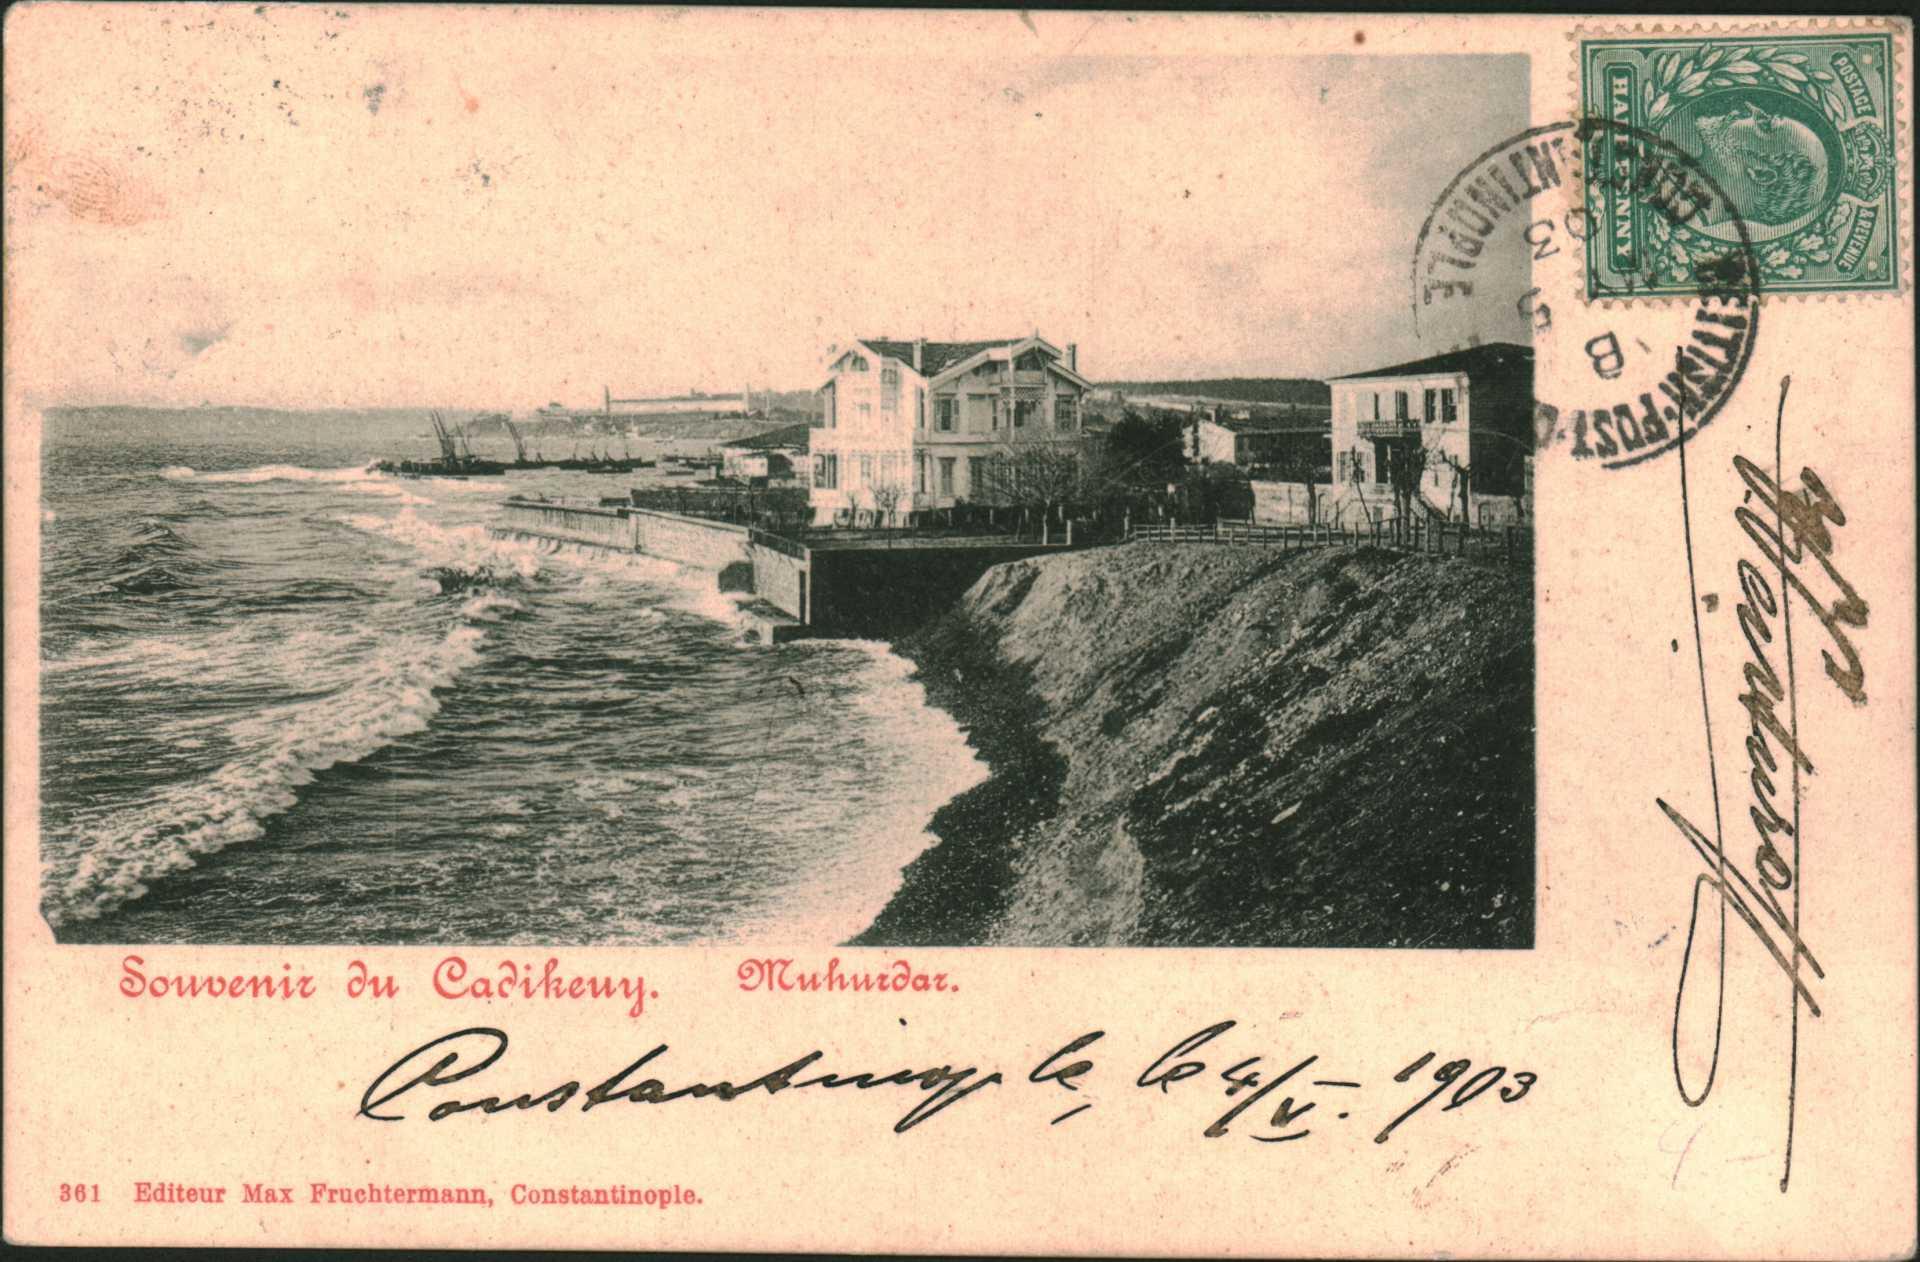 Sowuenir du Cadikeuy – Muhurday